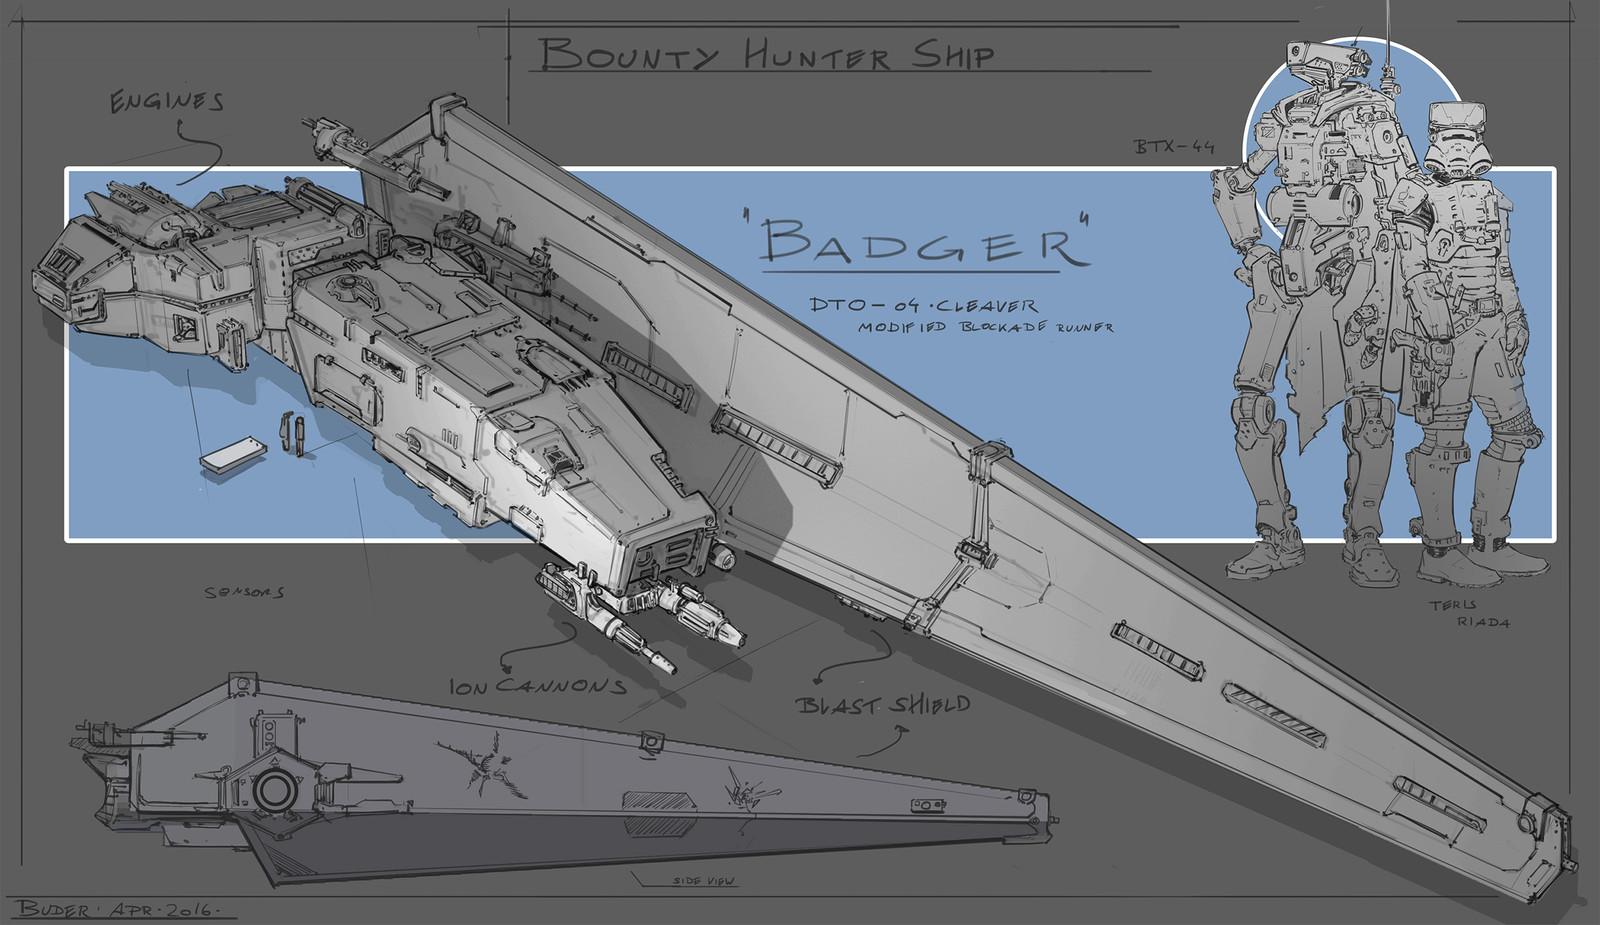 Bounty Hunter Ship